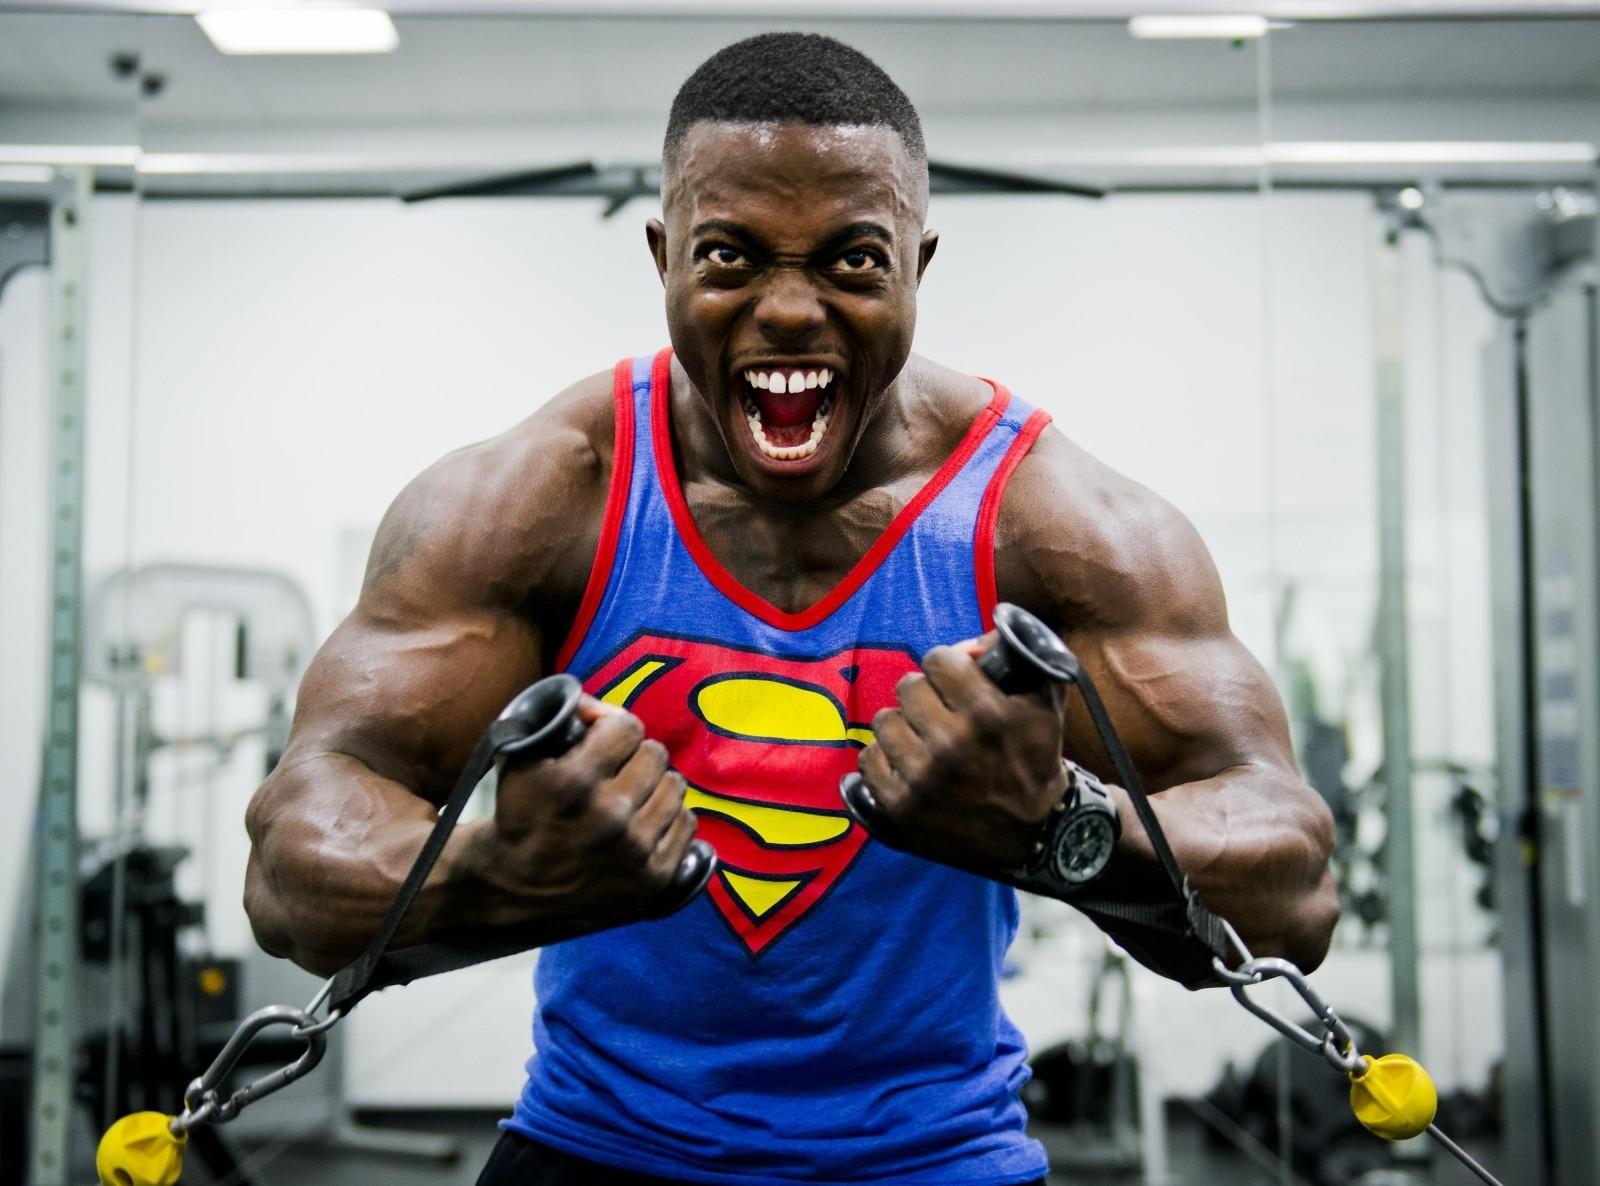 portrait-of-male-bodybuilder-exercising